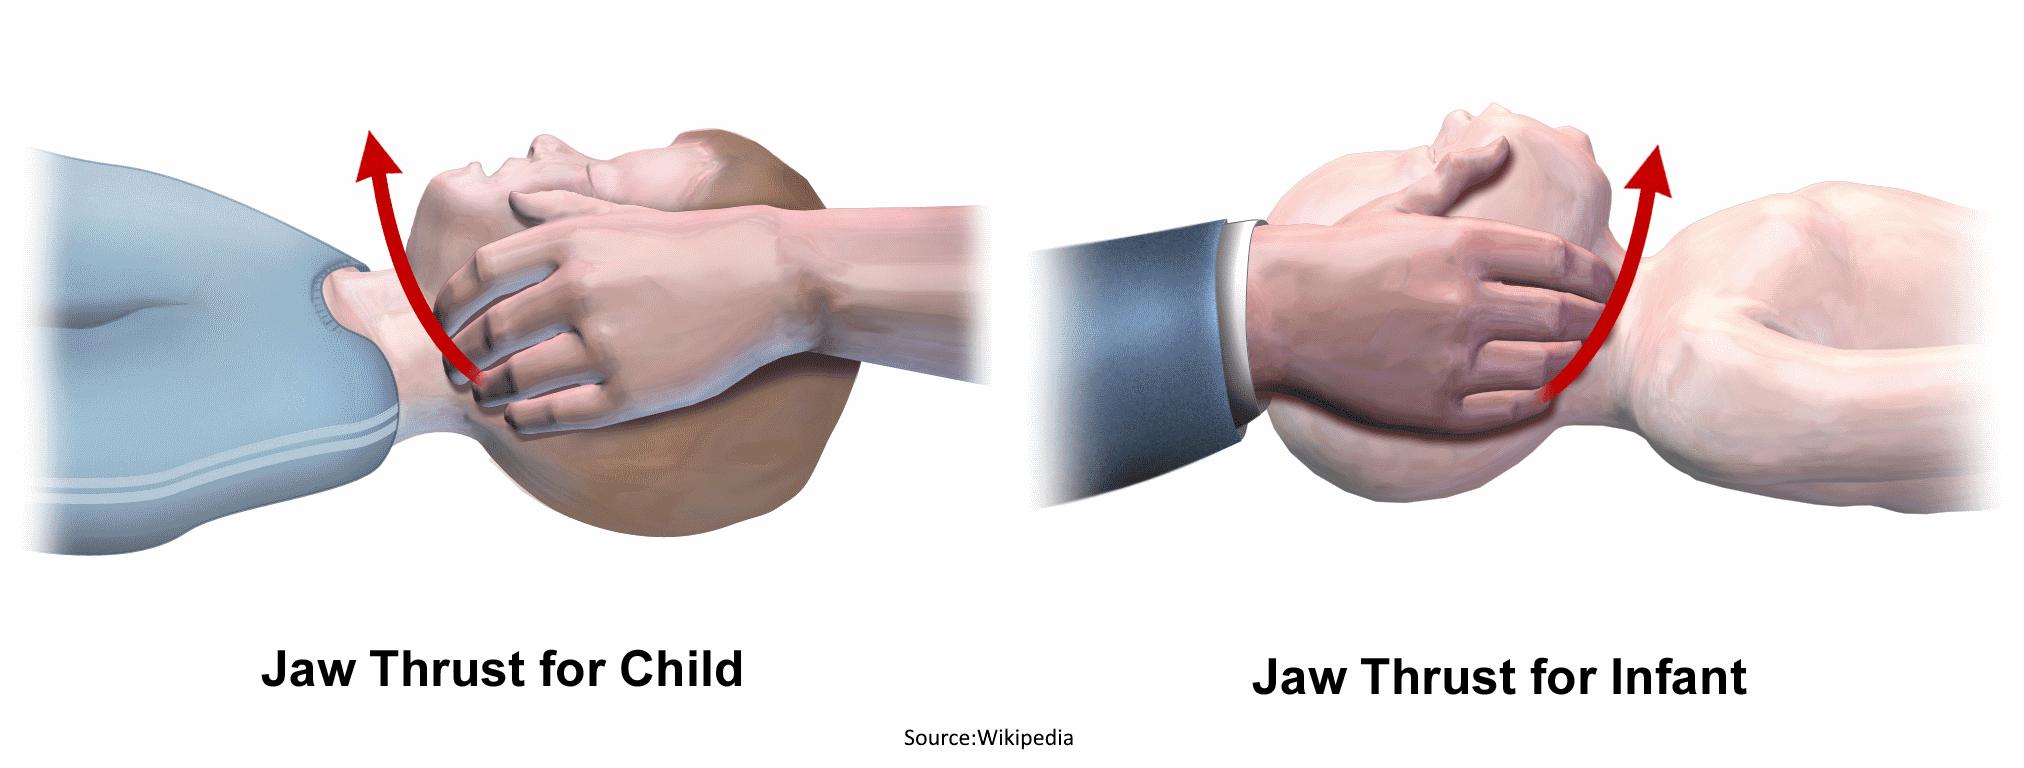 Pediatric jaw thrust